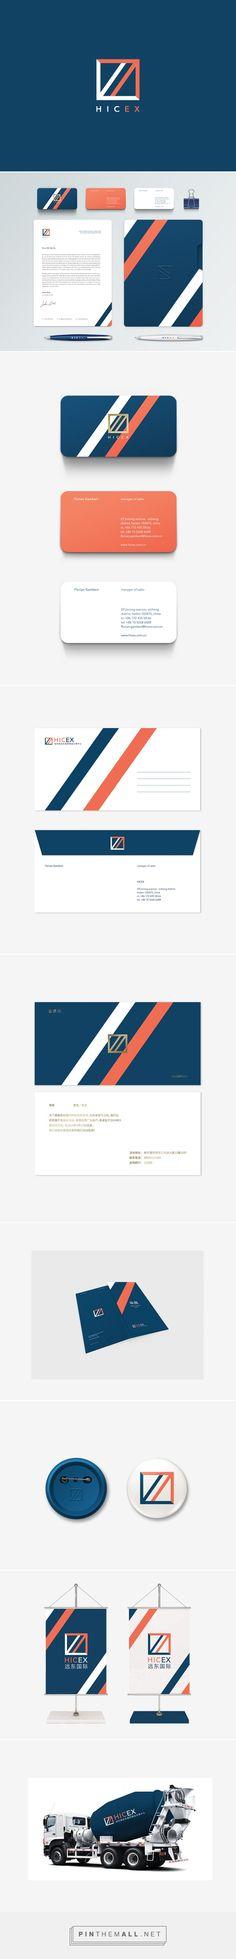 HICEX Harbin international Commodities Exchange on Behance | Fivestar Branding – Design and Branding Agency & Inspiration Gallery